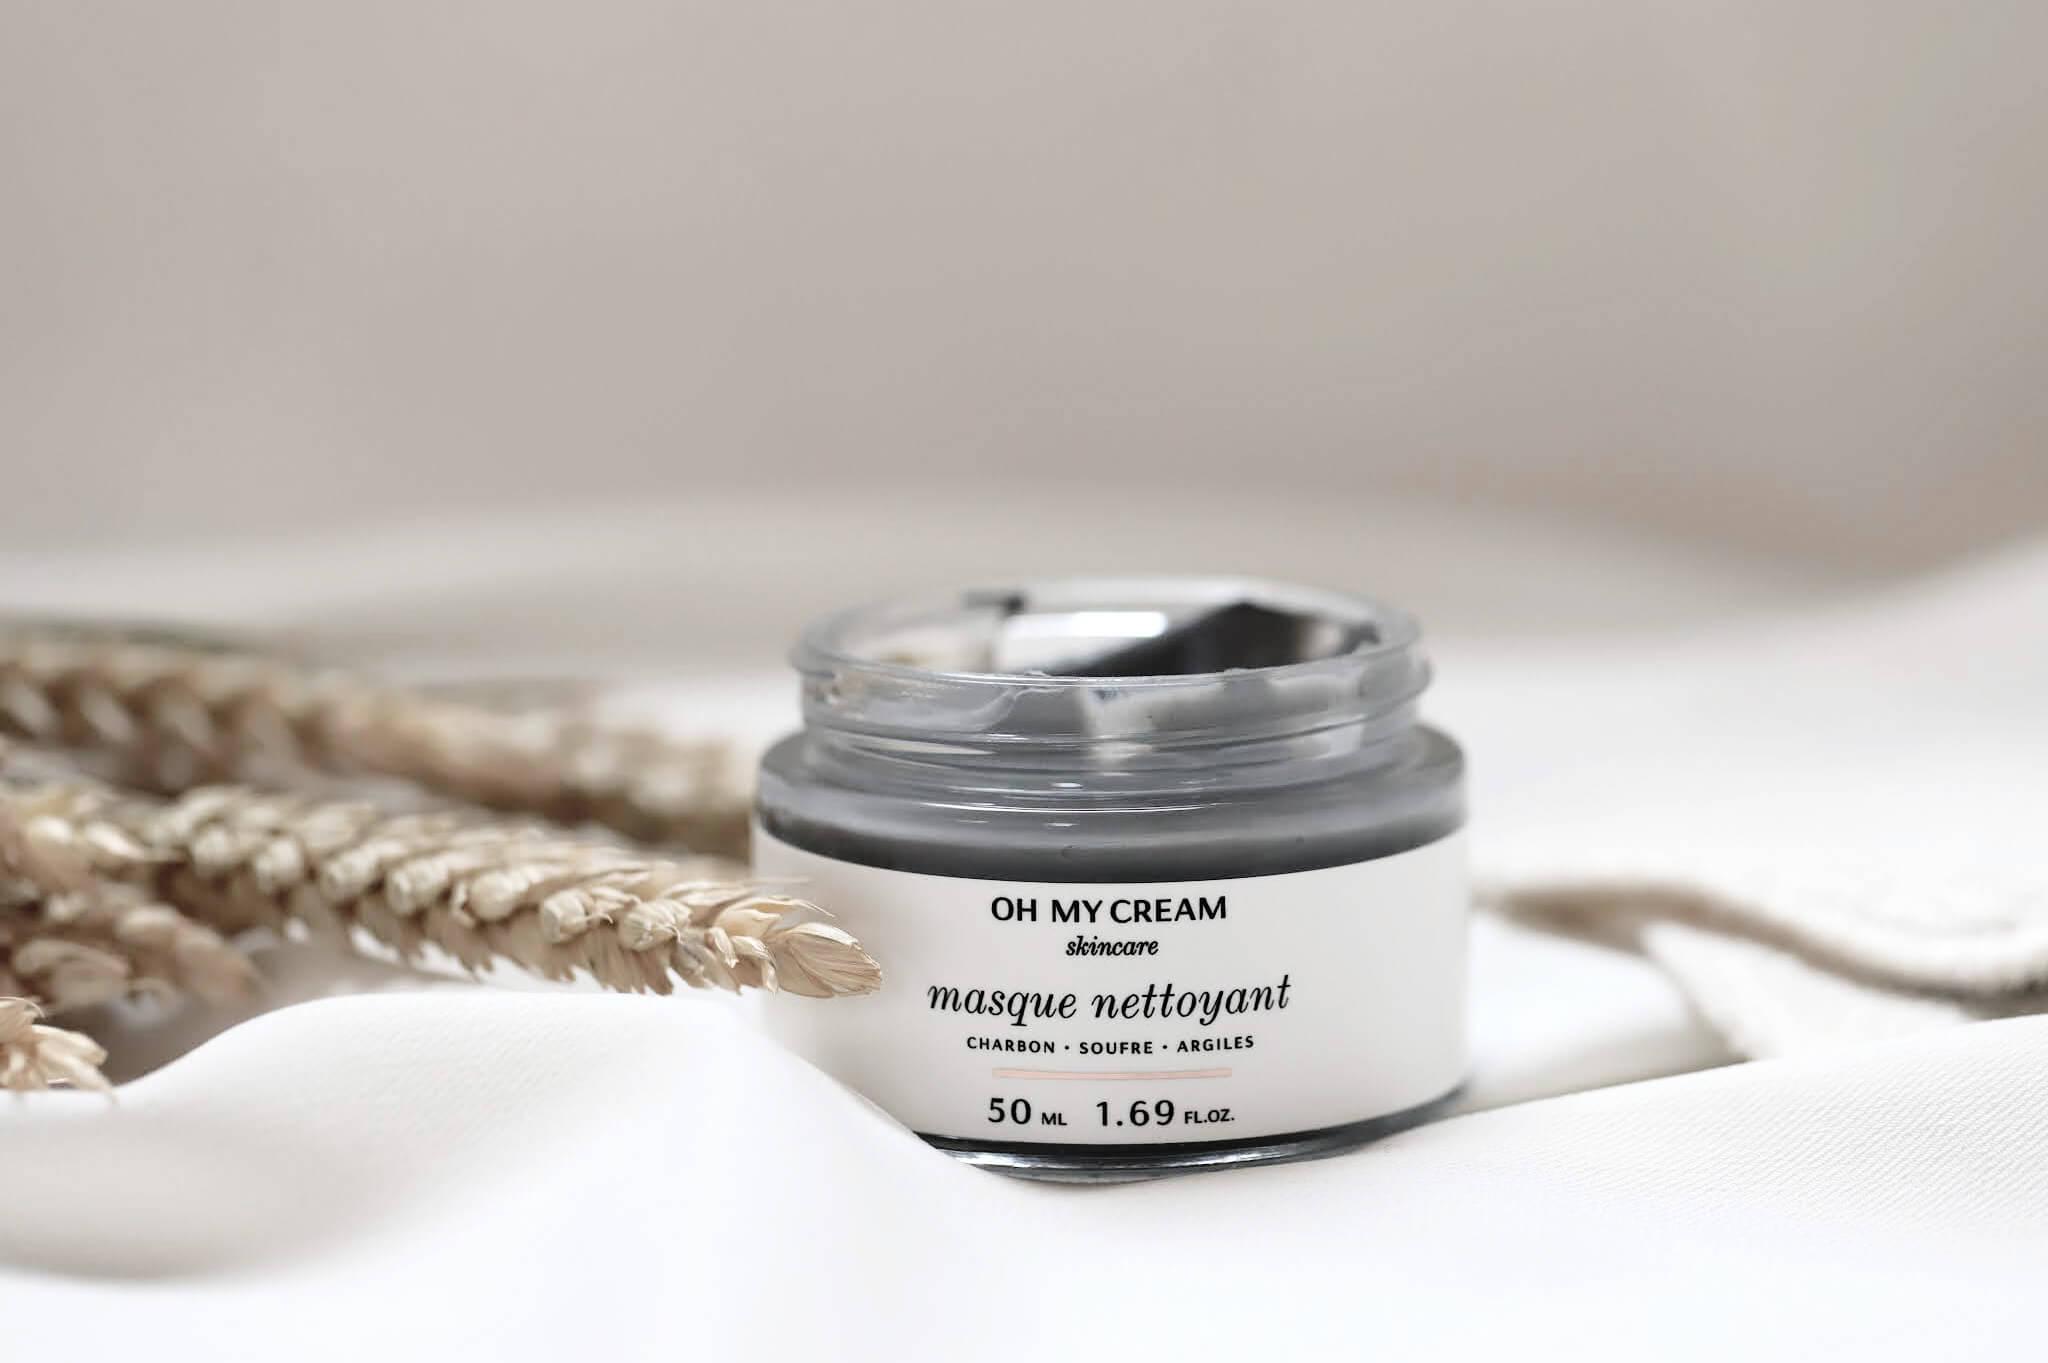 Oh My Cream Masque Nettoyant